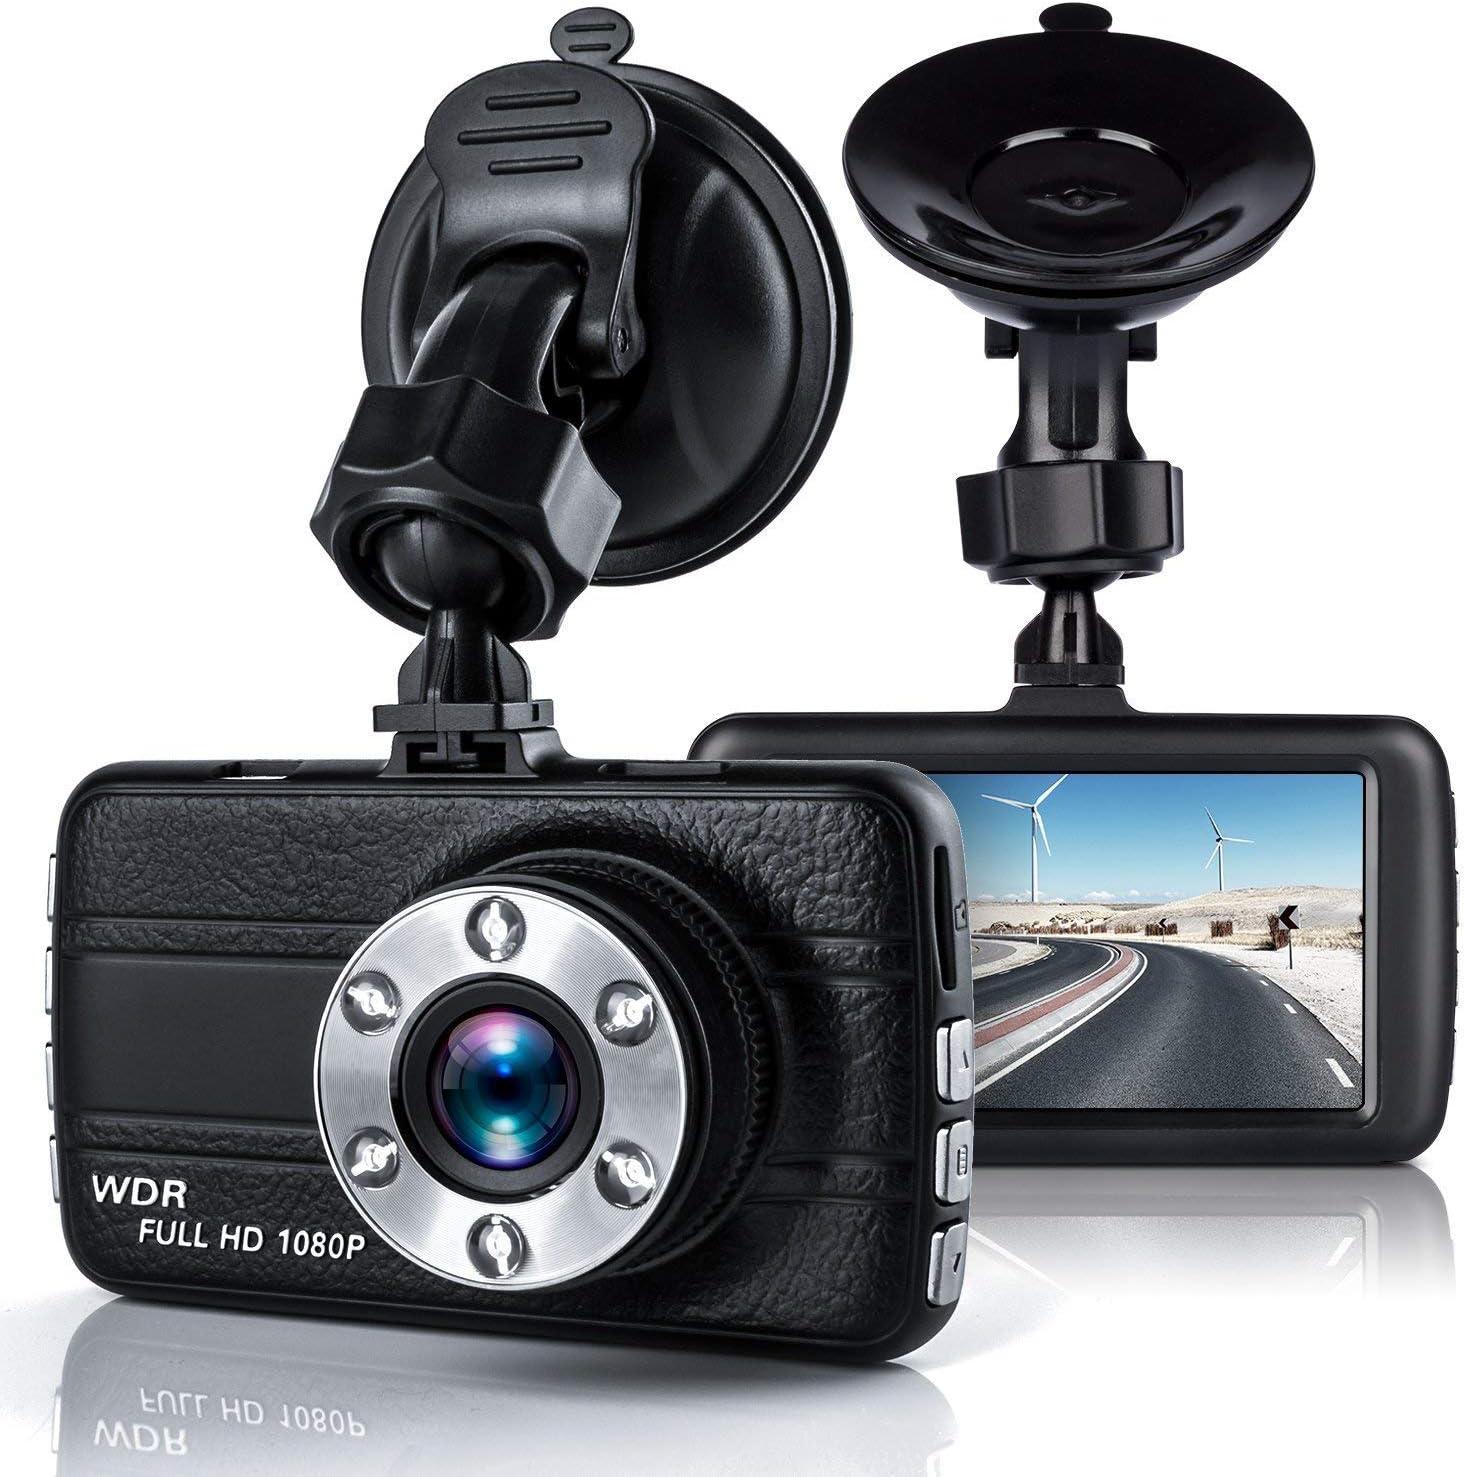 "Dash Cam, EZone Car Dashboard Camera 3.0"" Full HD 1080P DVR Dash Camera 170 Degree Wide Angle On-Dash Camcorder with Night Vision Display"